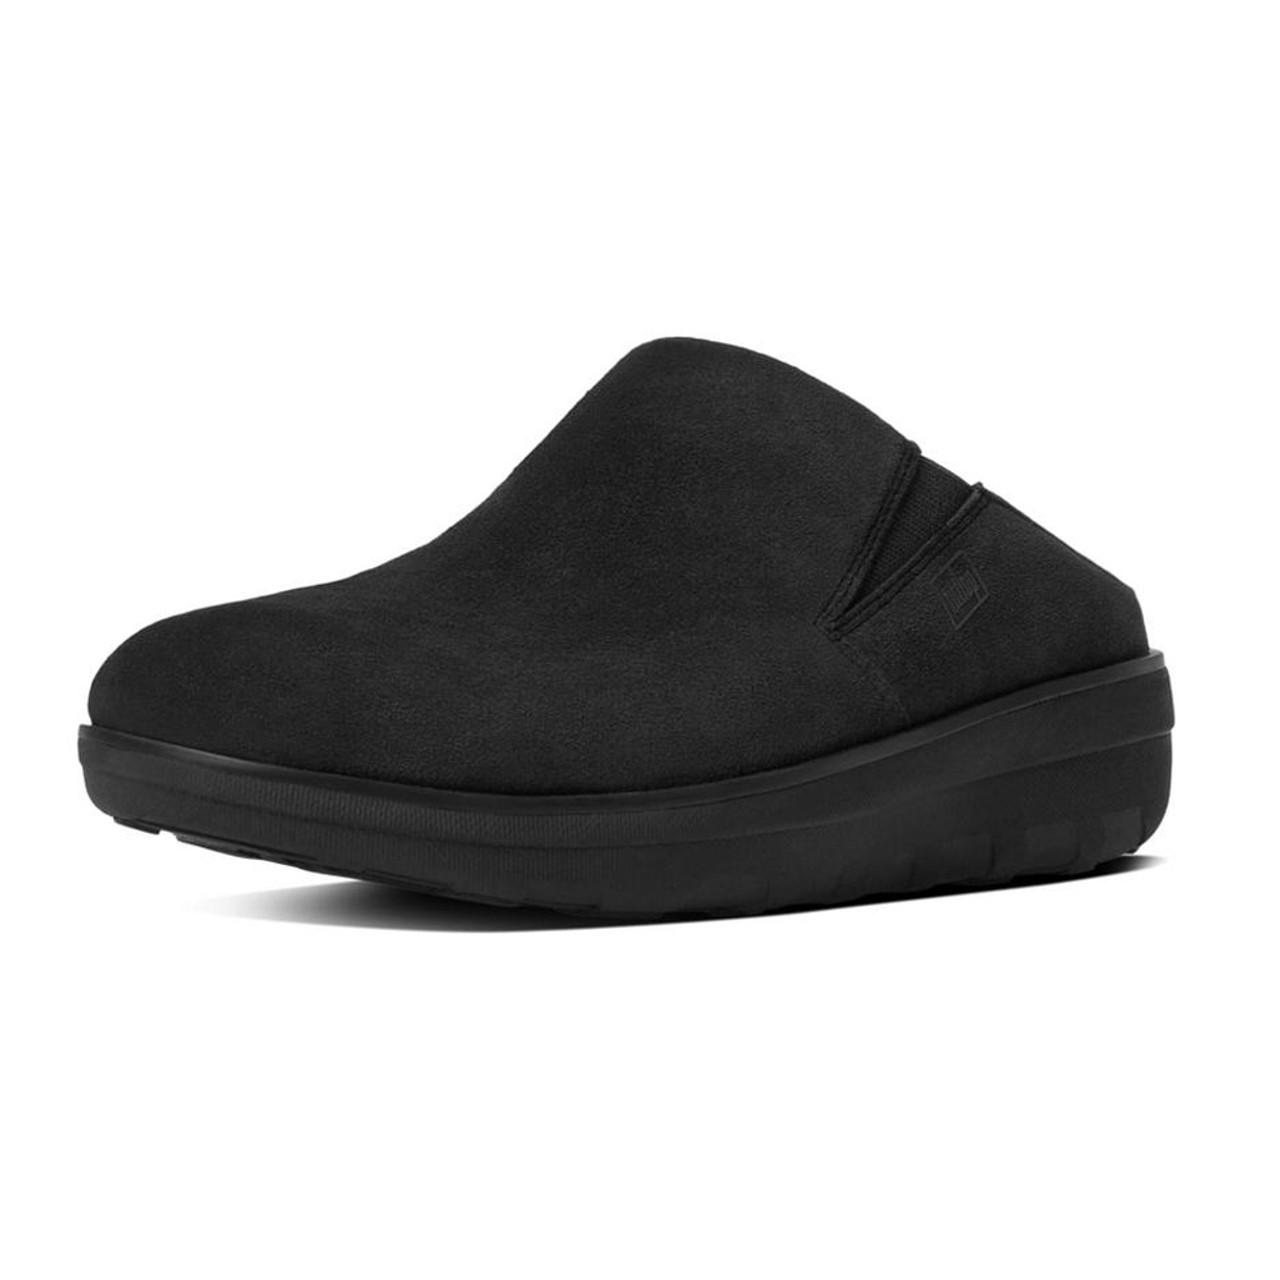 b54a18b6f058 Fitflop Women s Loaff Suede Clogs Black - Shop now   Shoolu.com